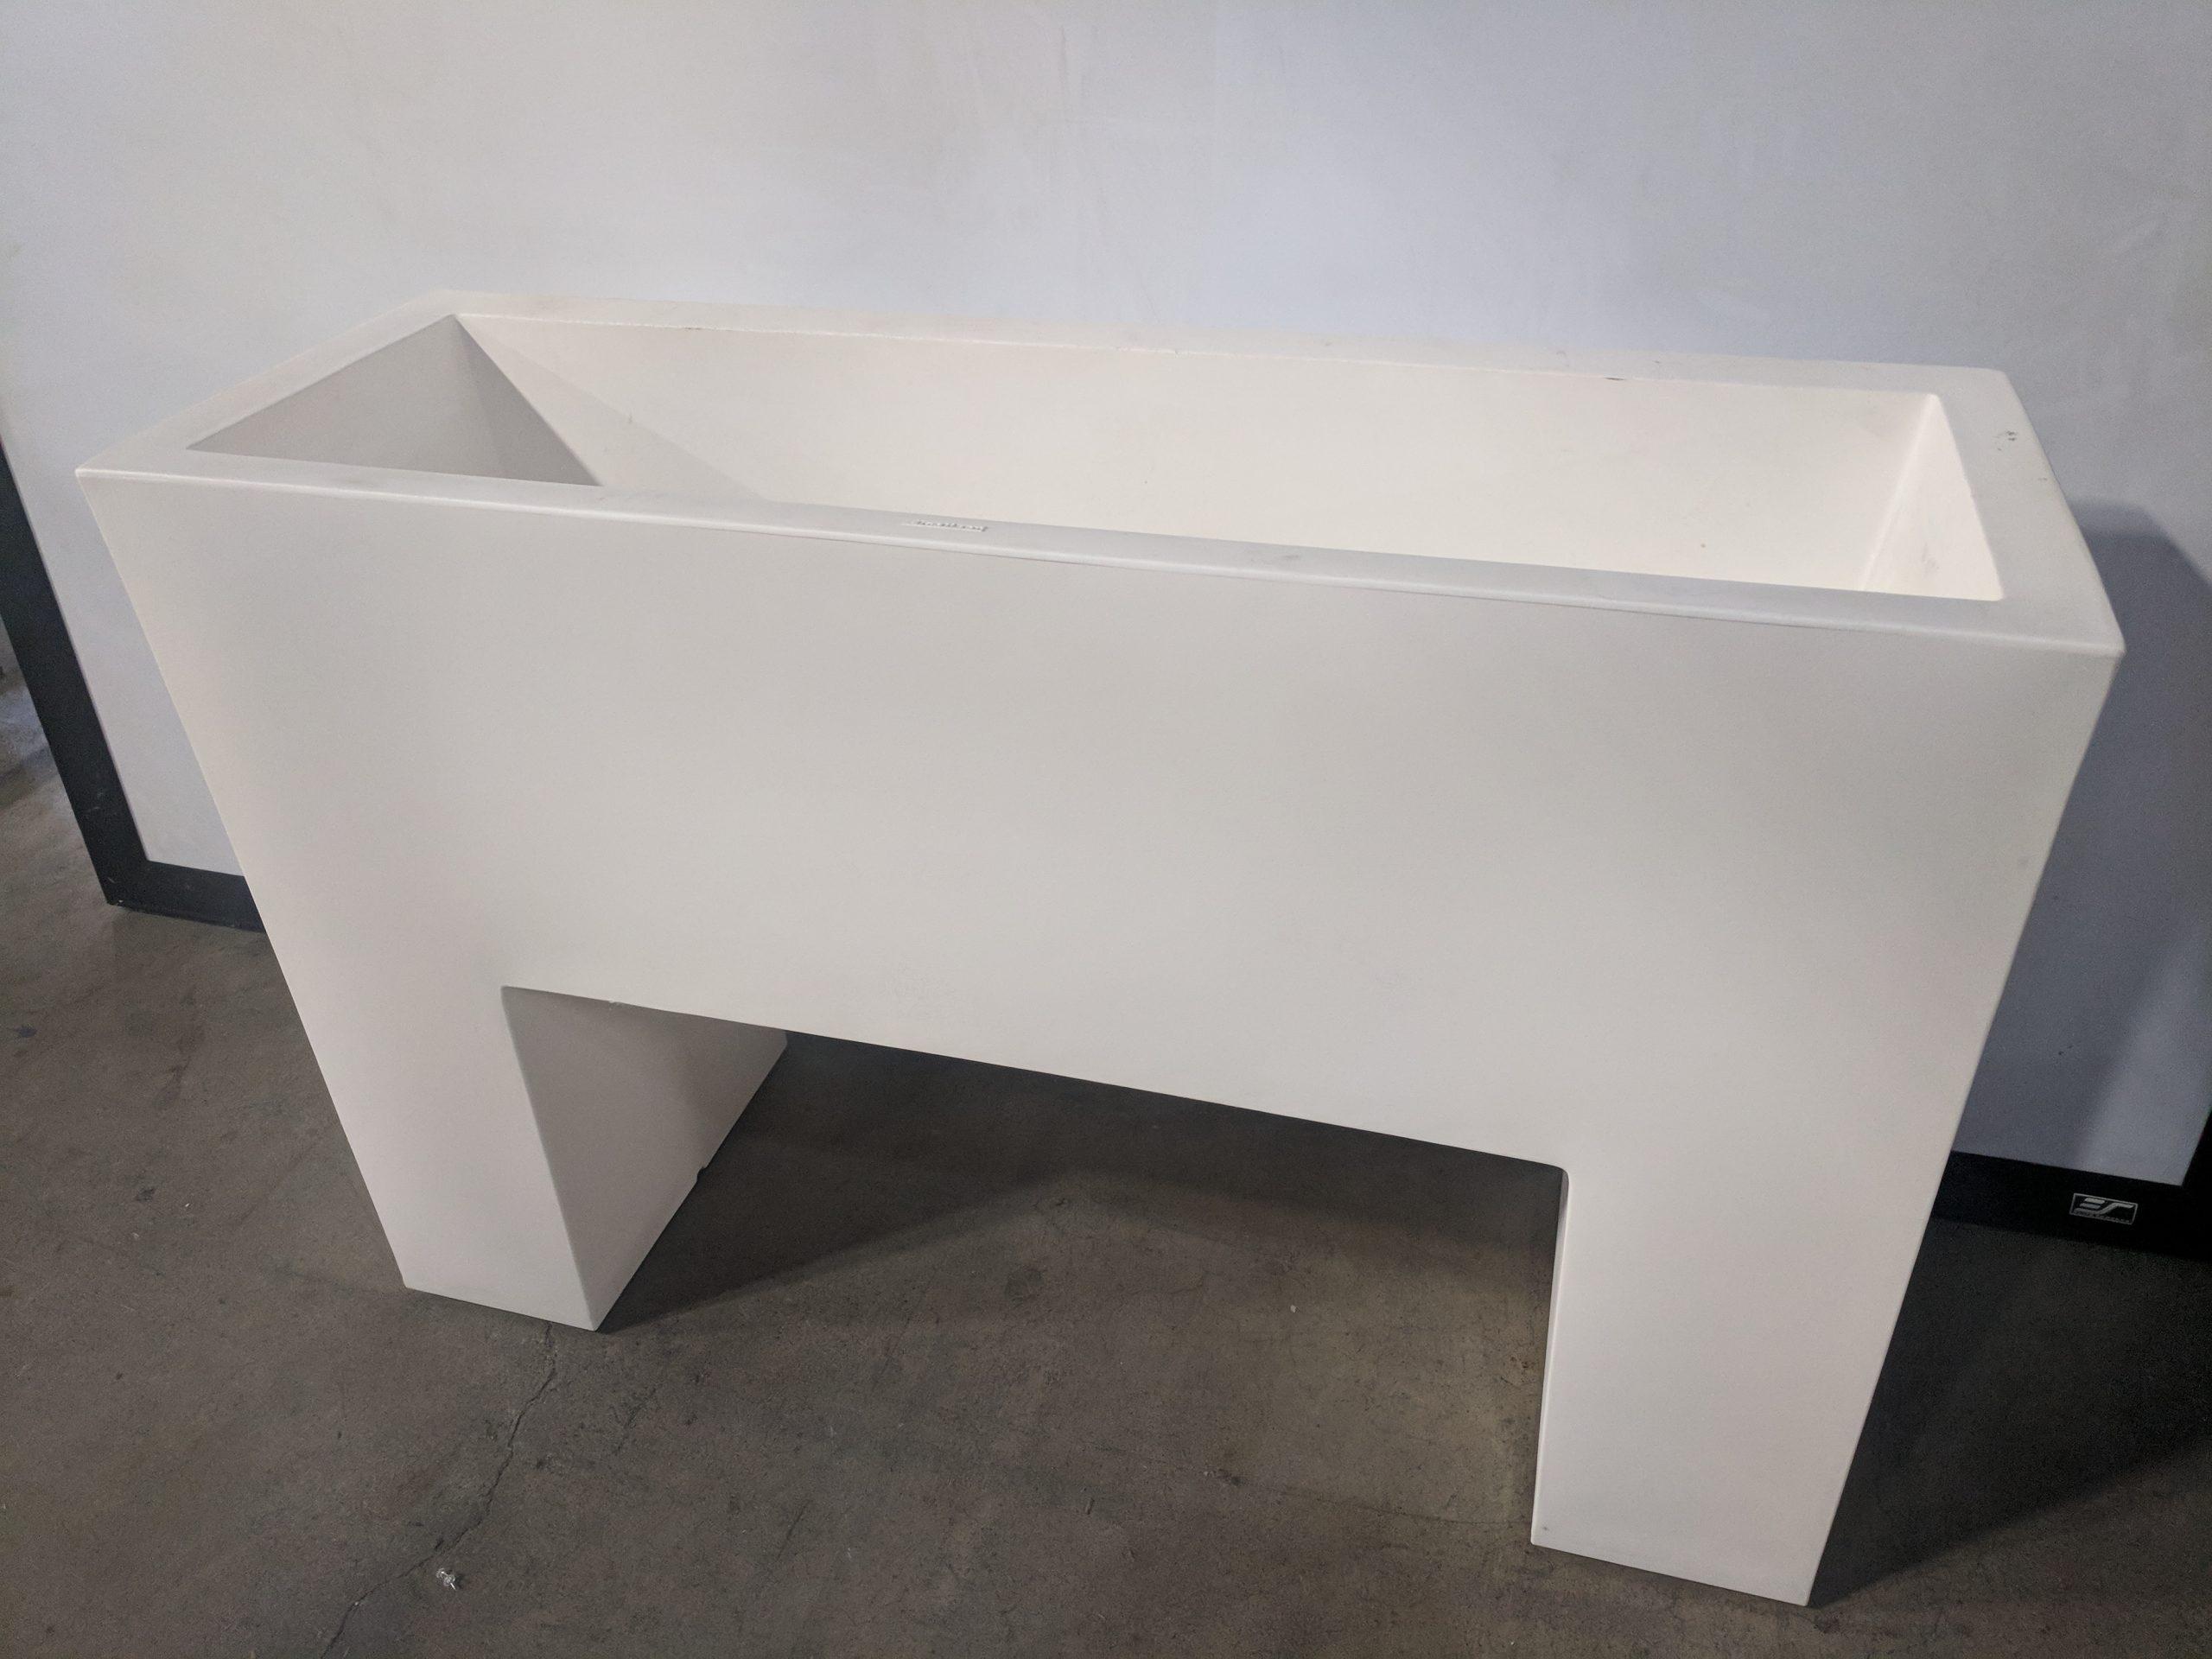 PASTIKEN RAISED BED, WHITE PLASTIC BED, 48Wx16Dx32H